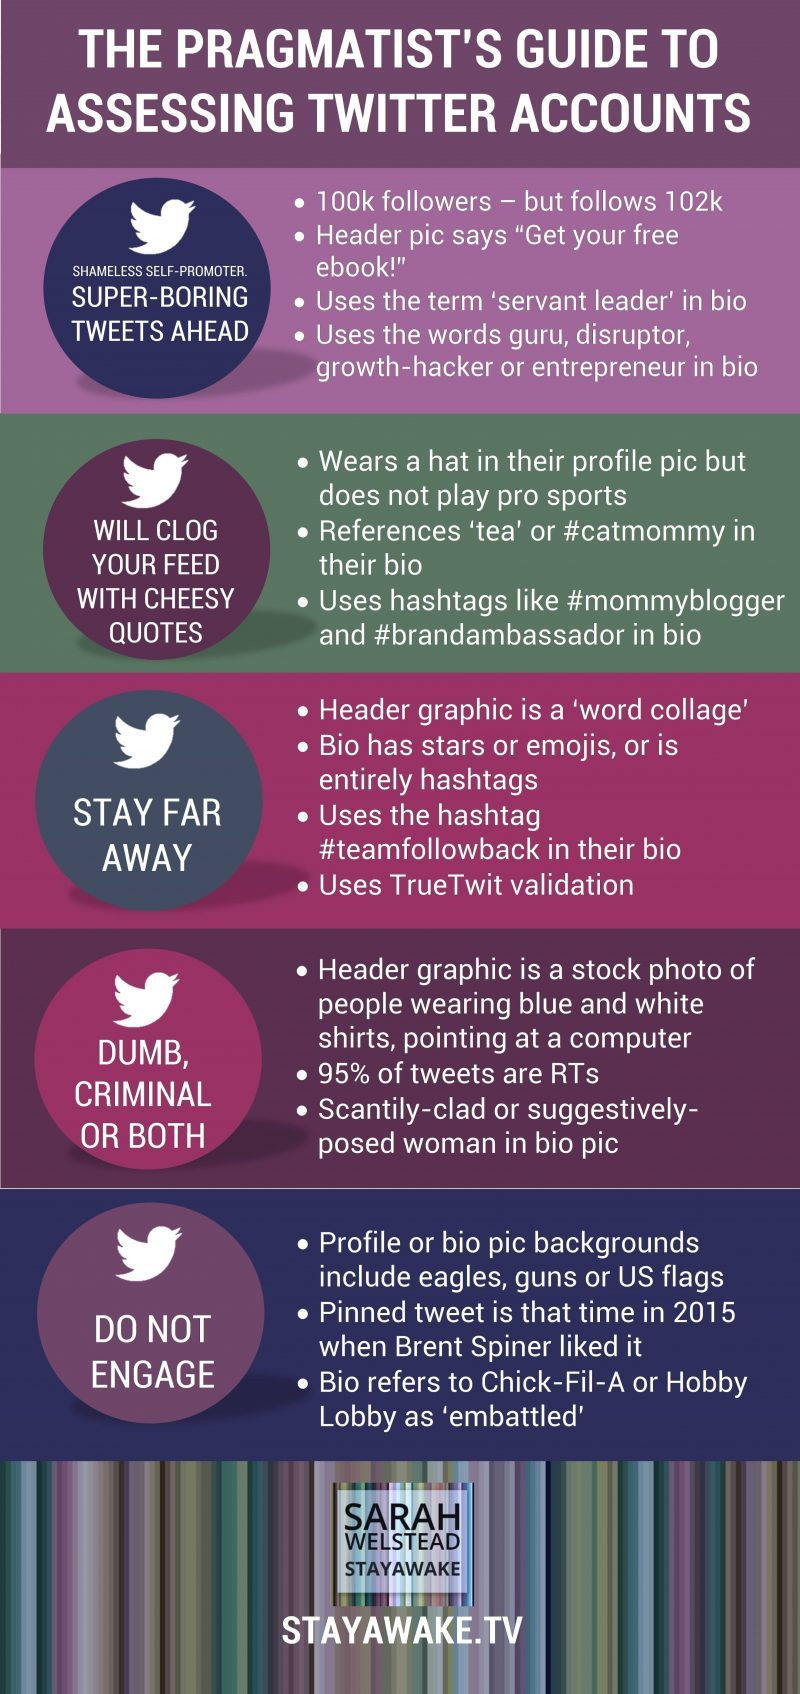 Pragmatist's guide to Twitter accounts infographic